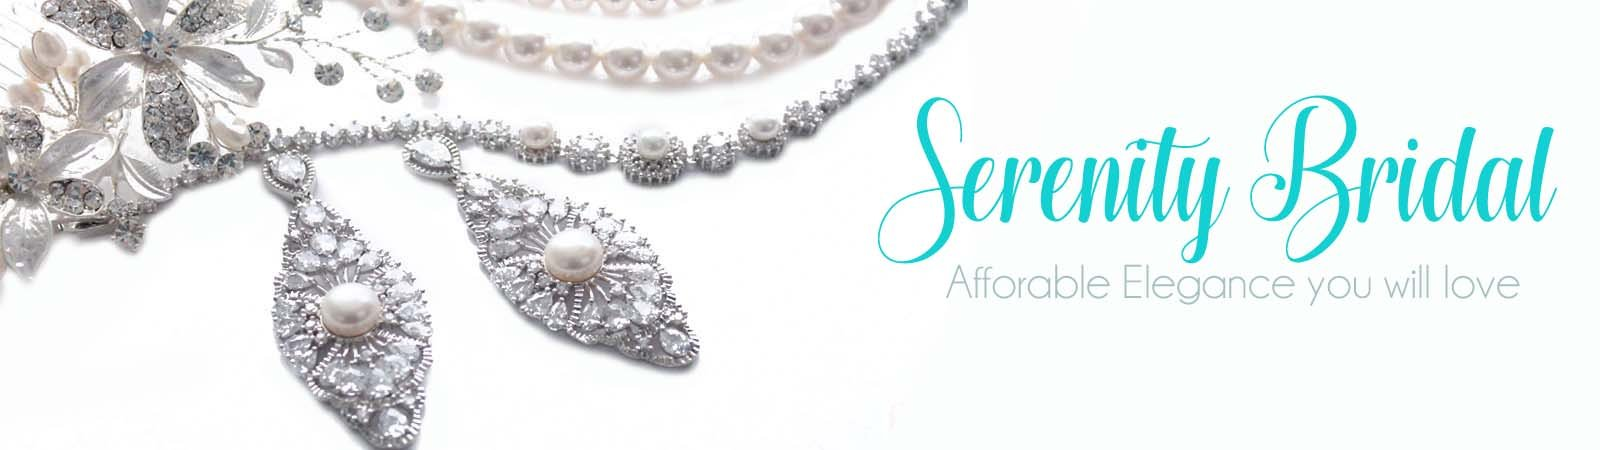 Serenity Bridal Jewelry's profile image